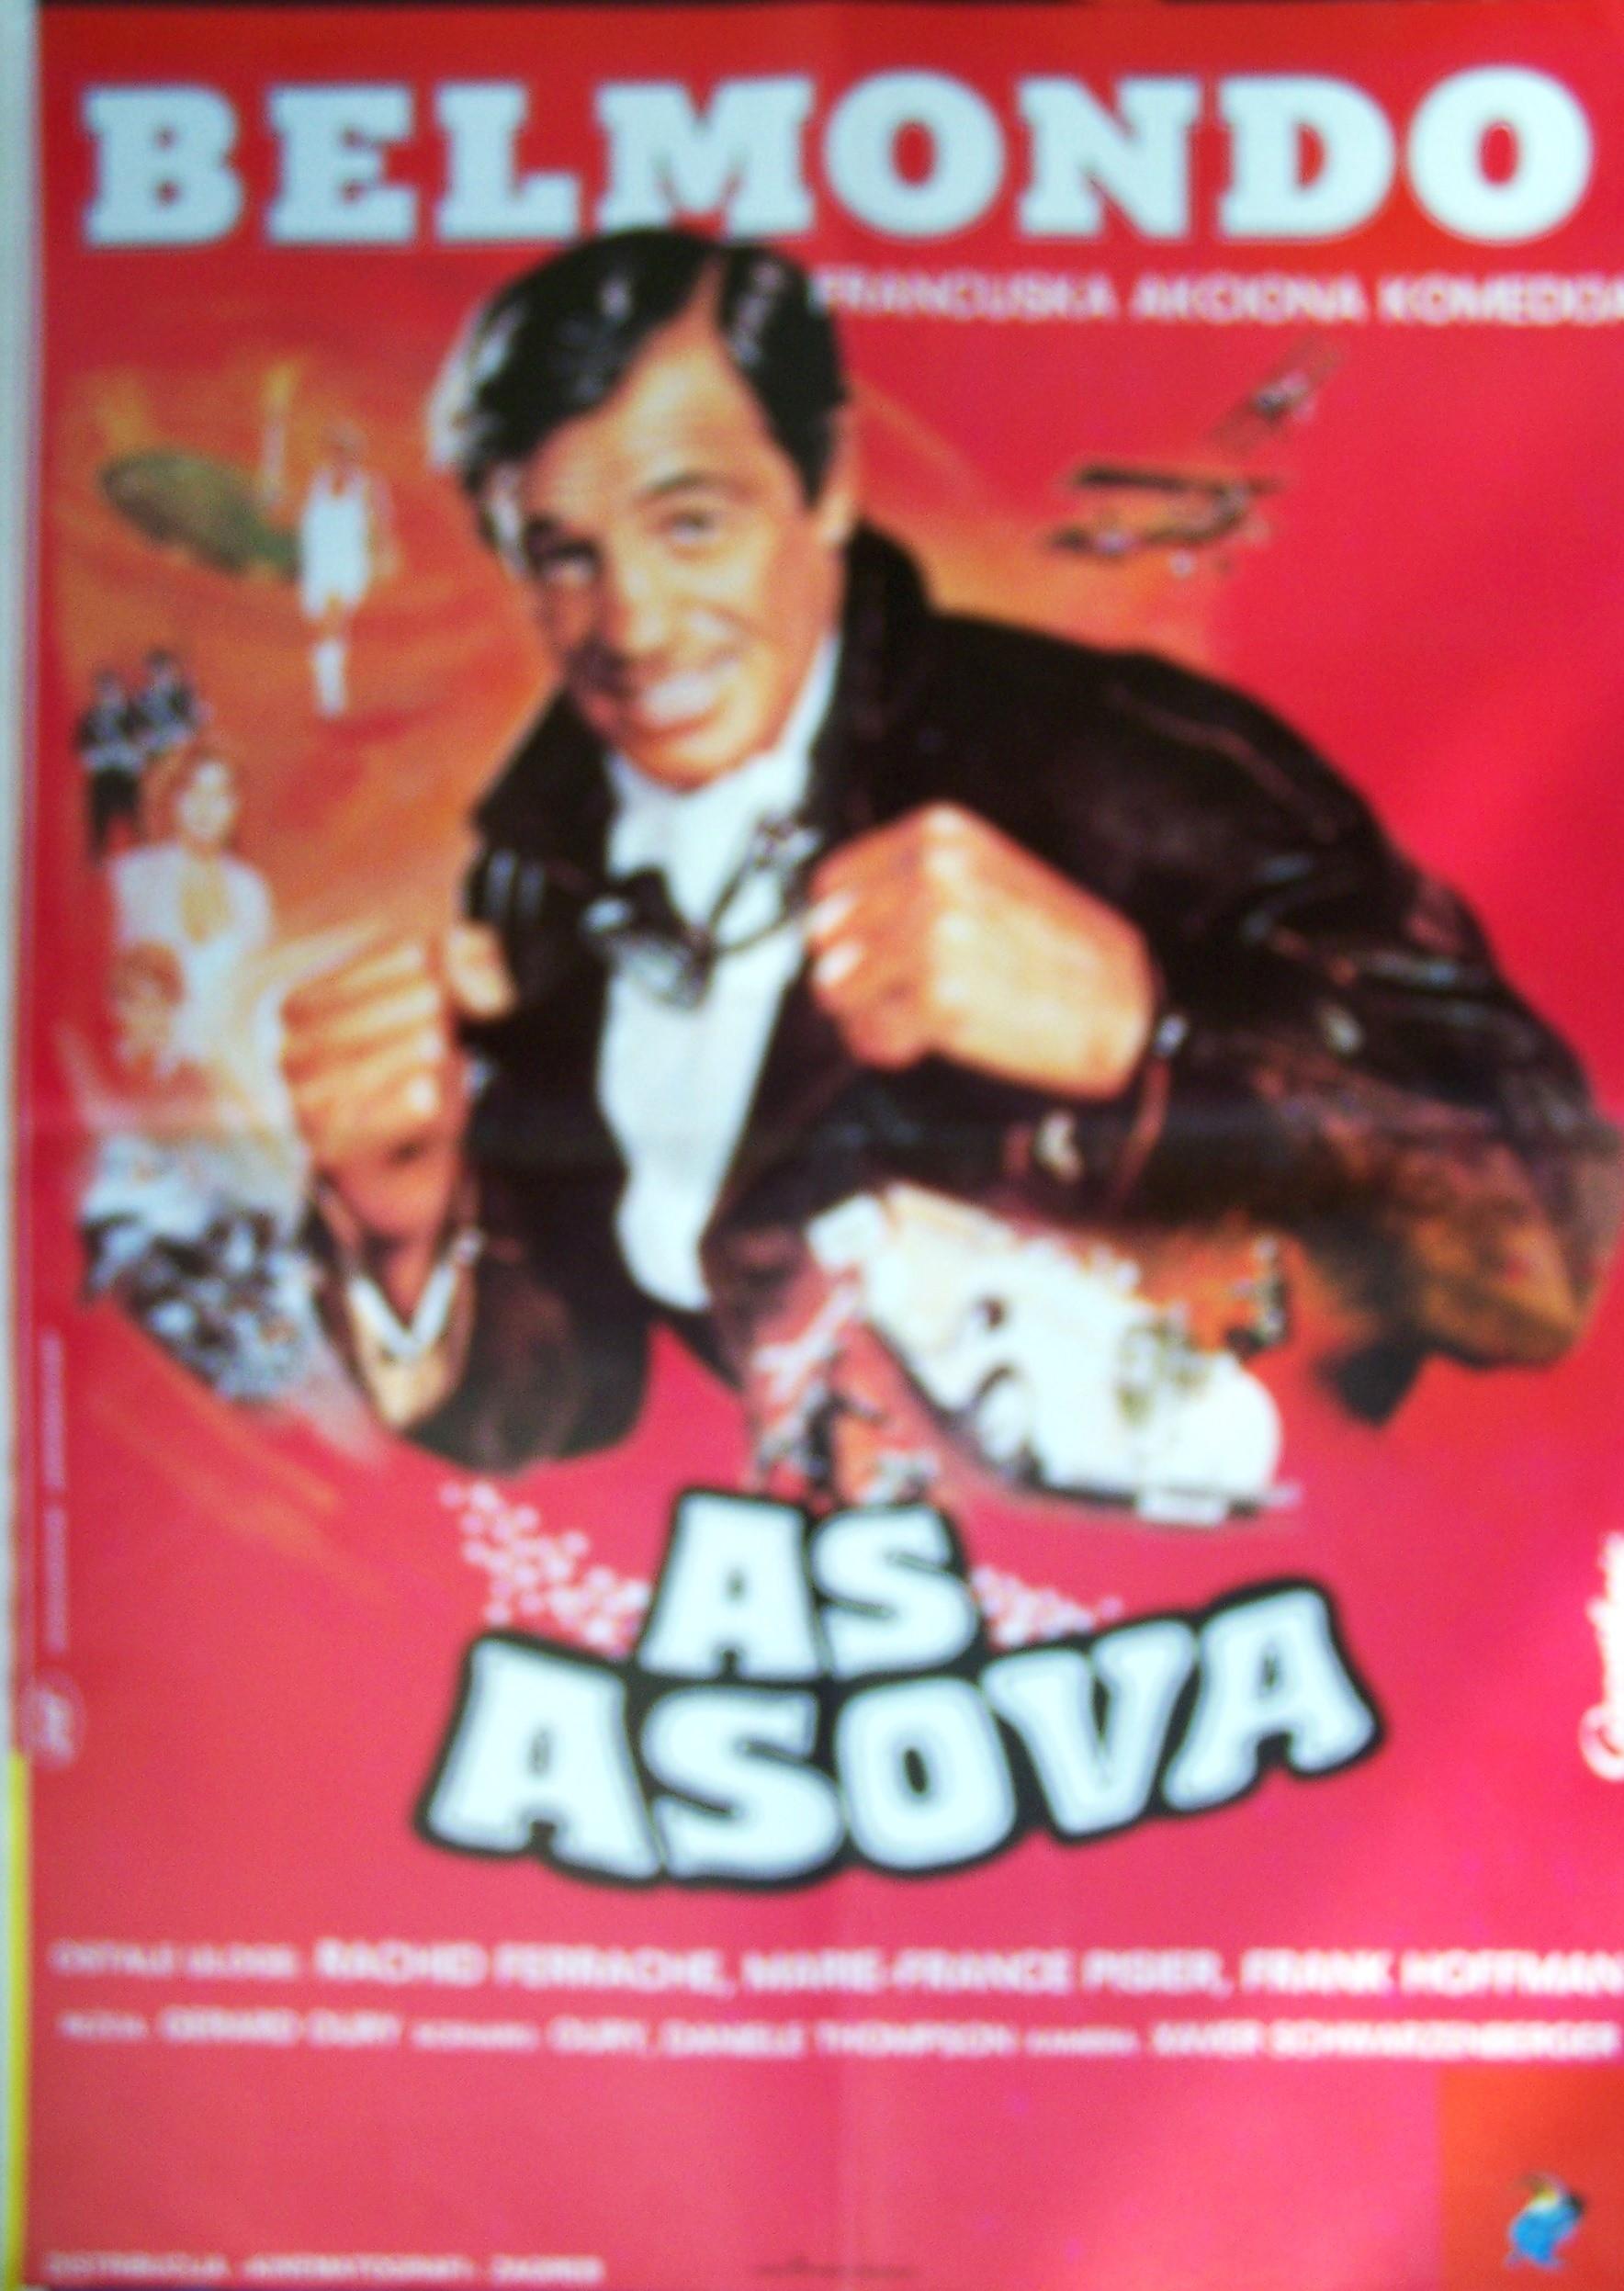 As Asova